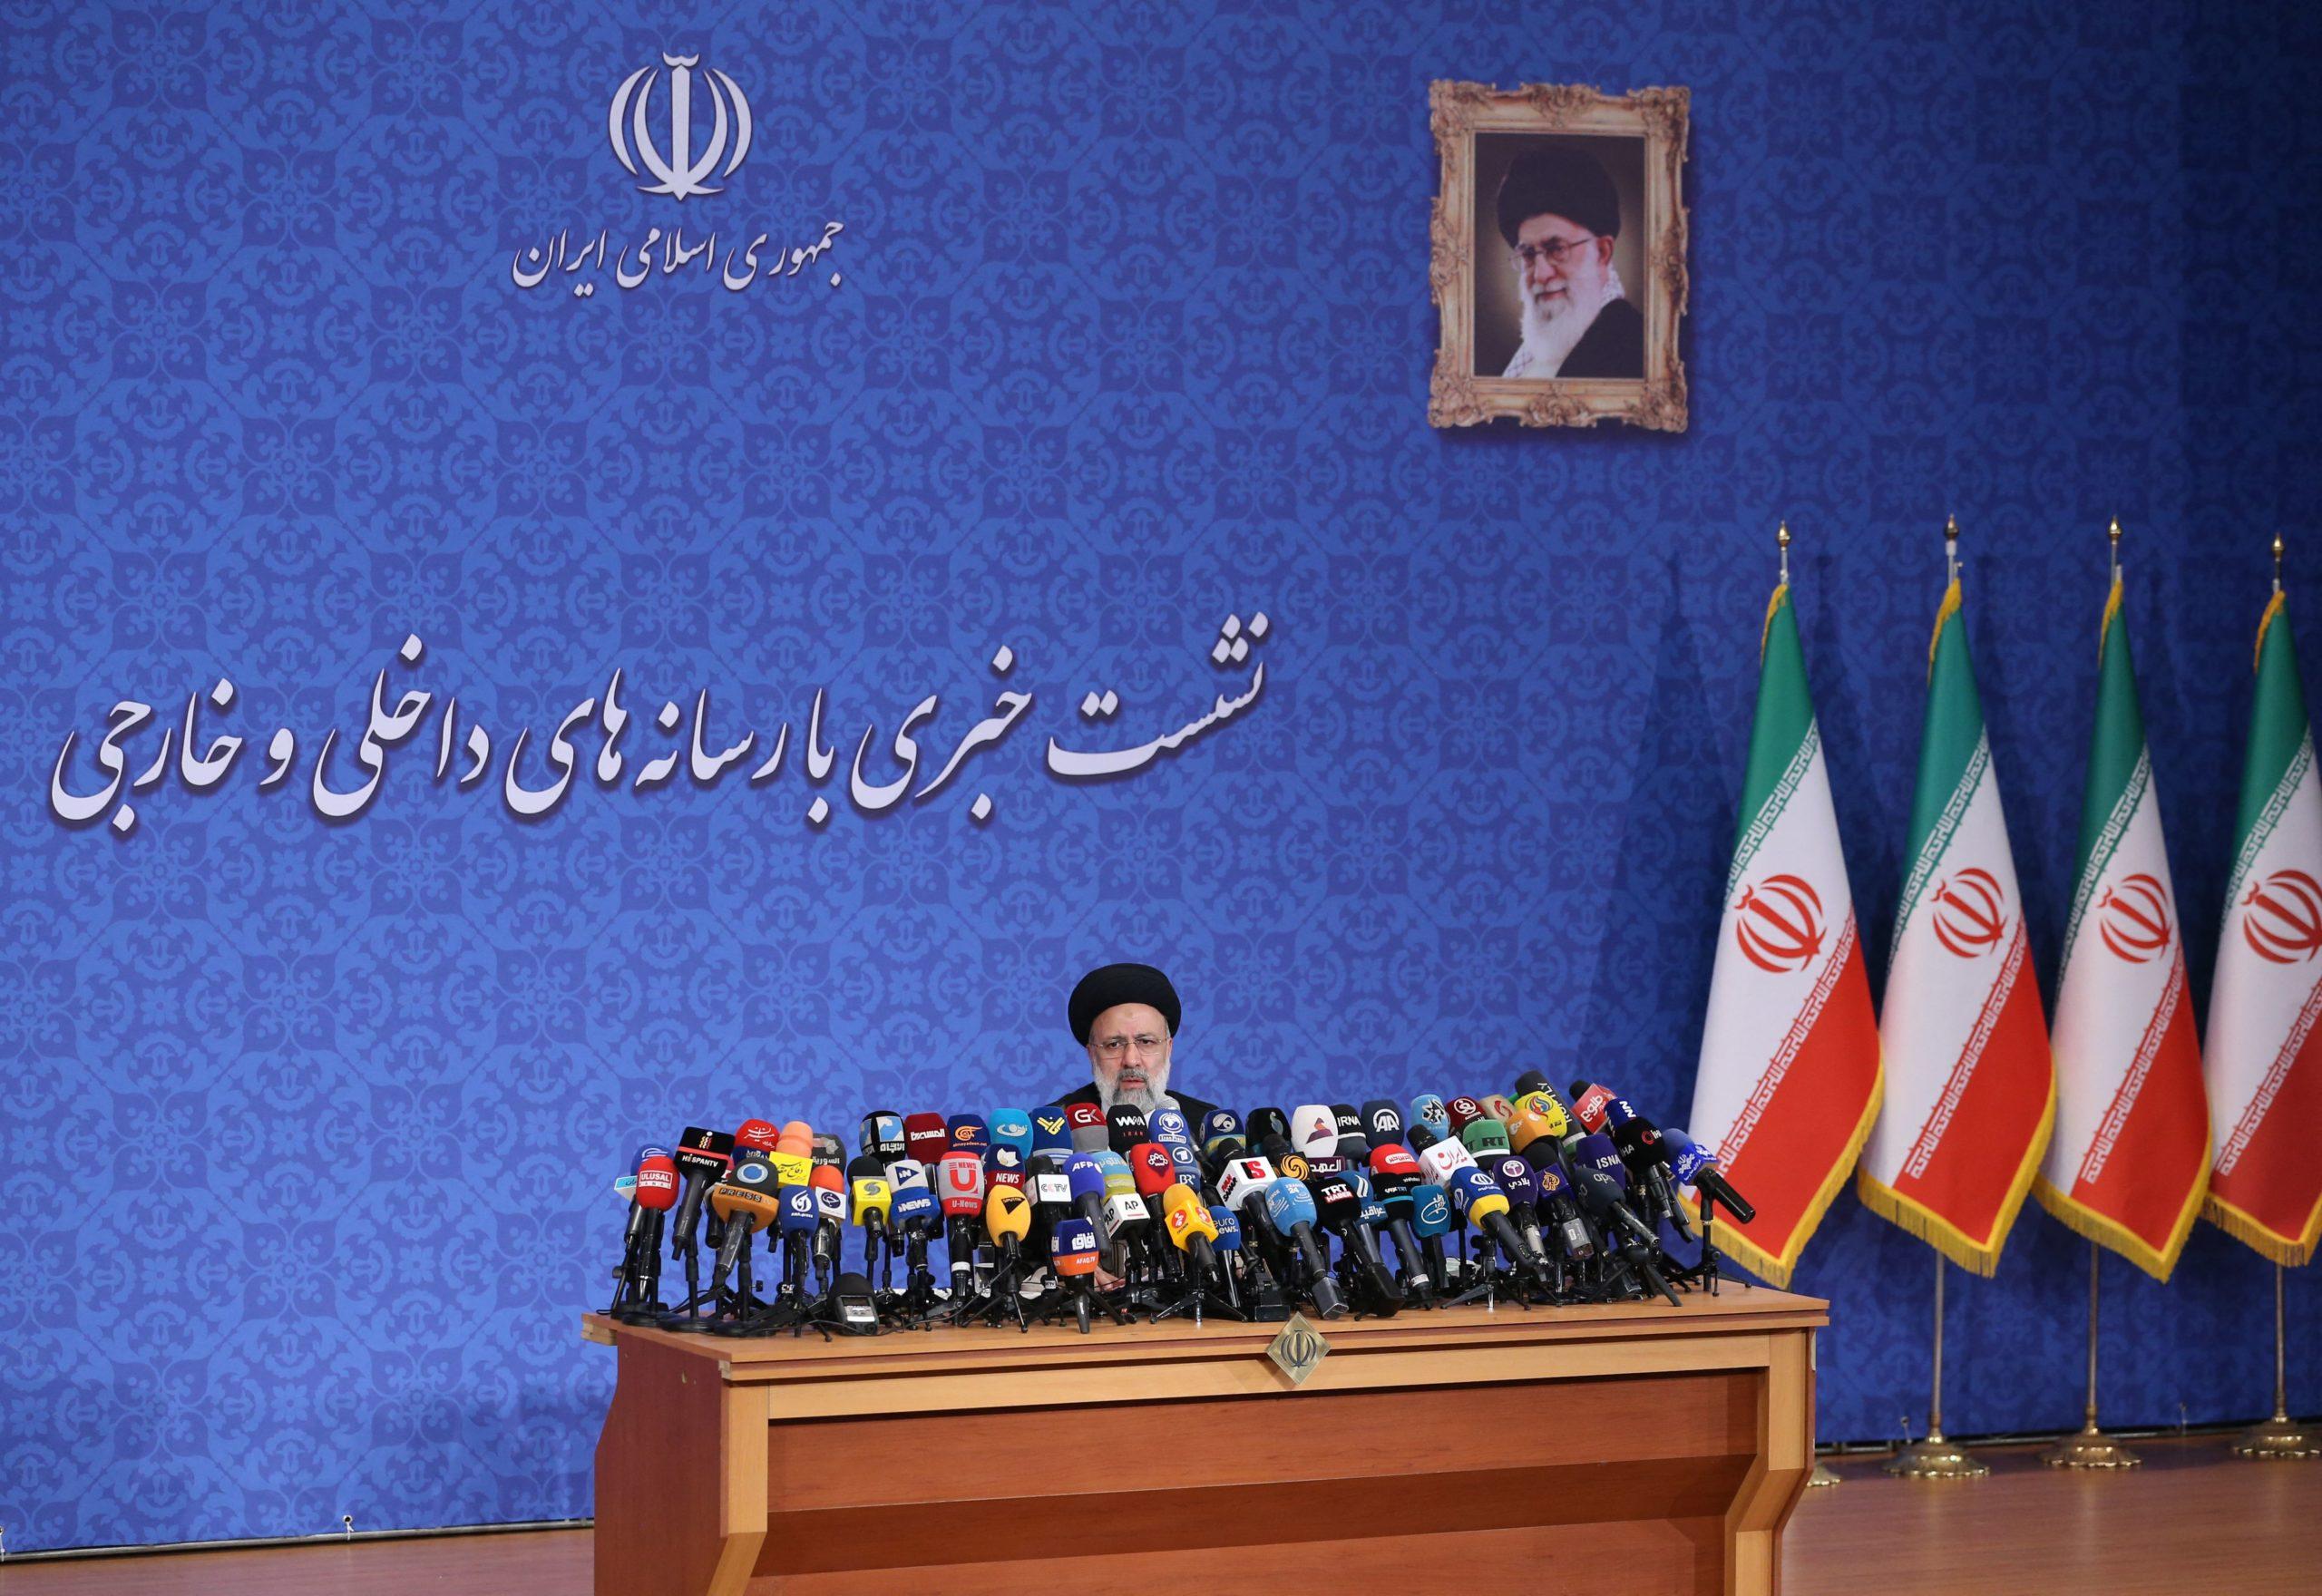 Iranian President-elect Ebrahim Raisi sits under a portrait of the Islamic republic's supreme leader Ayatollah Ali Khamenei on June 21. (Atta Kenare/AFP via Getty Images)